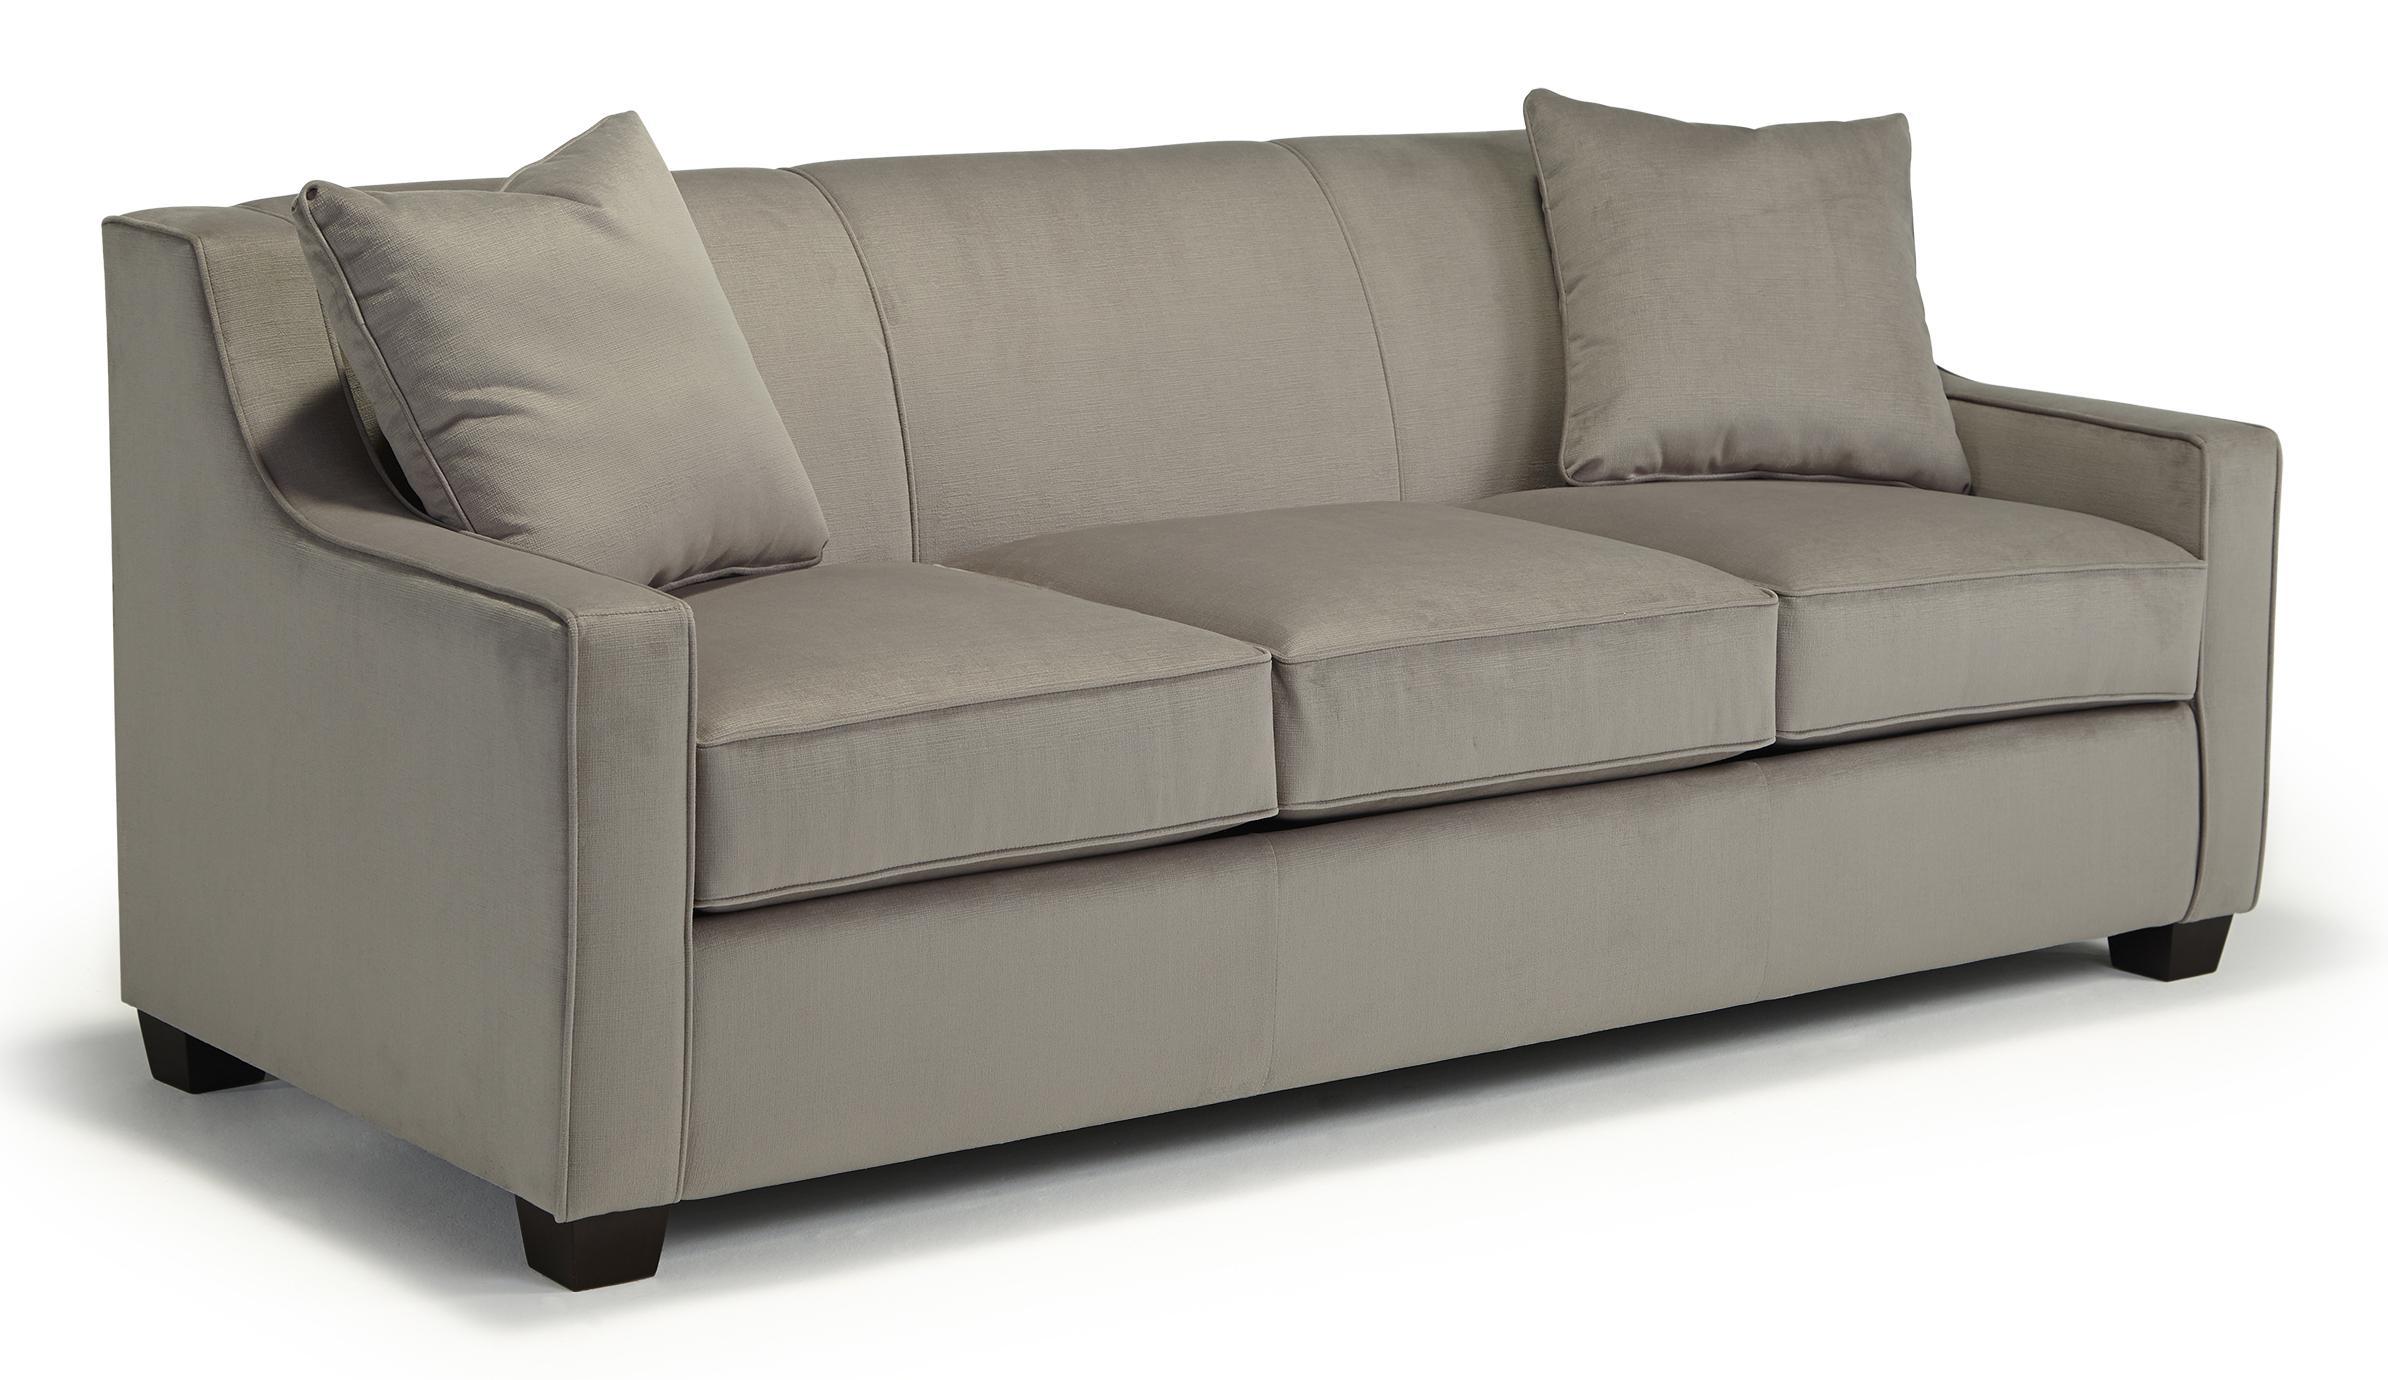 Marinette Queen Sleeper w/ MemoryFoam Mattress by Best Home Furnishings at Mueller Furniture